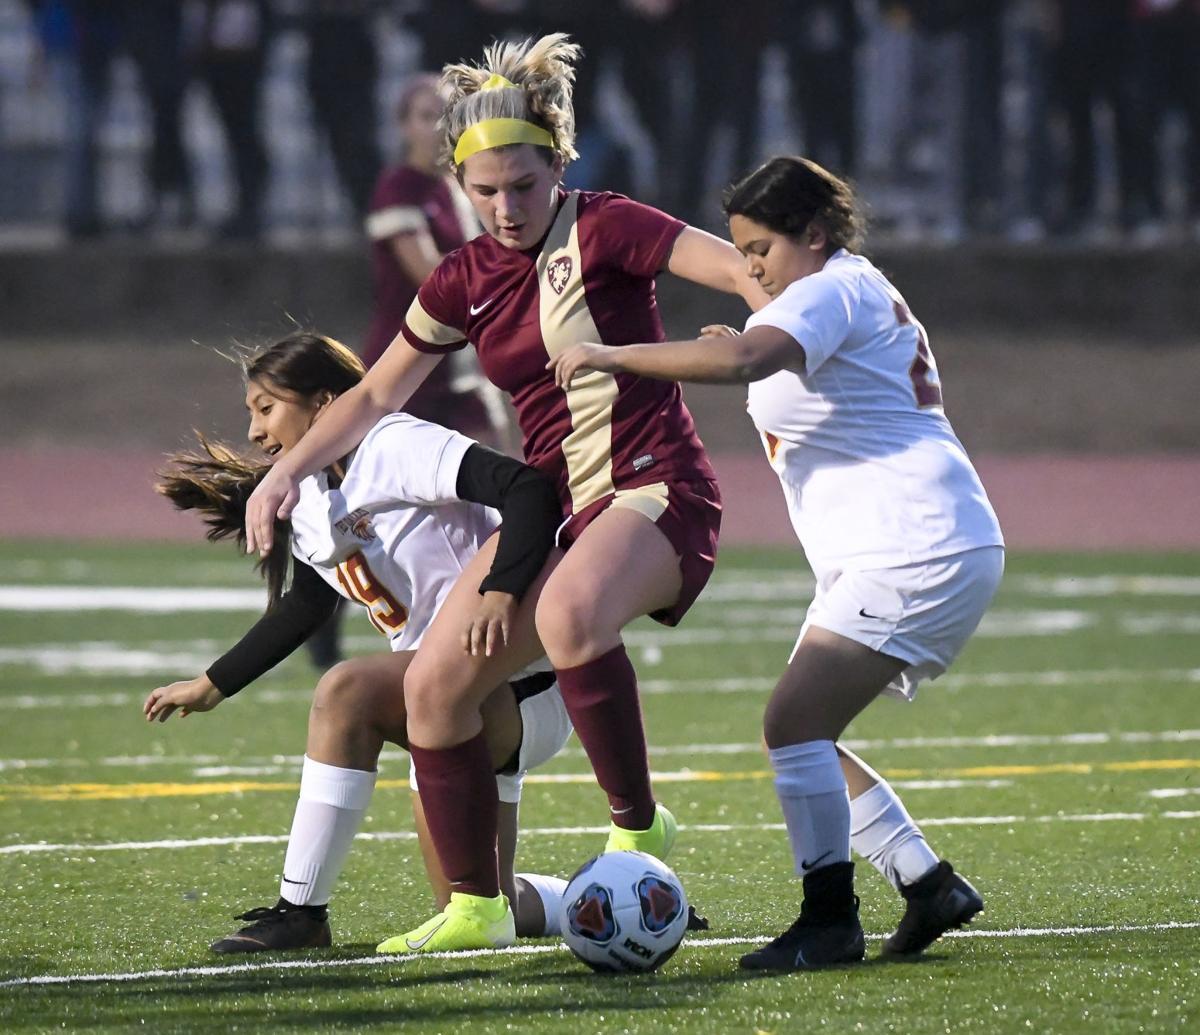 CVHS vs The Dalles soccer 2